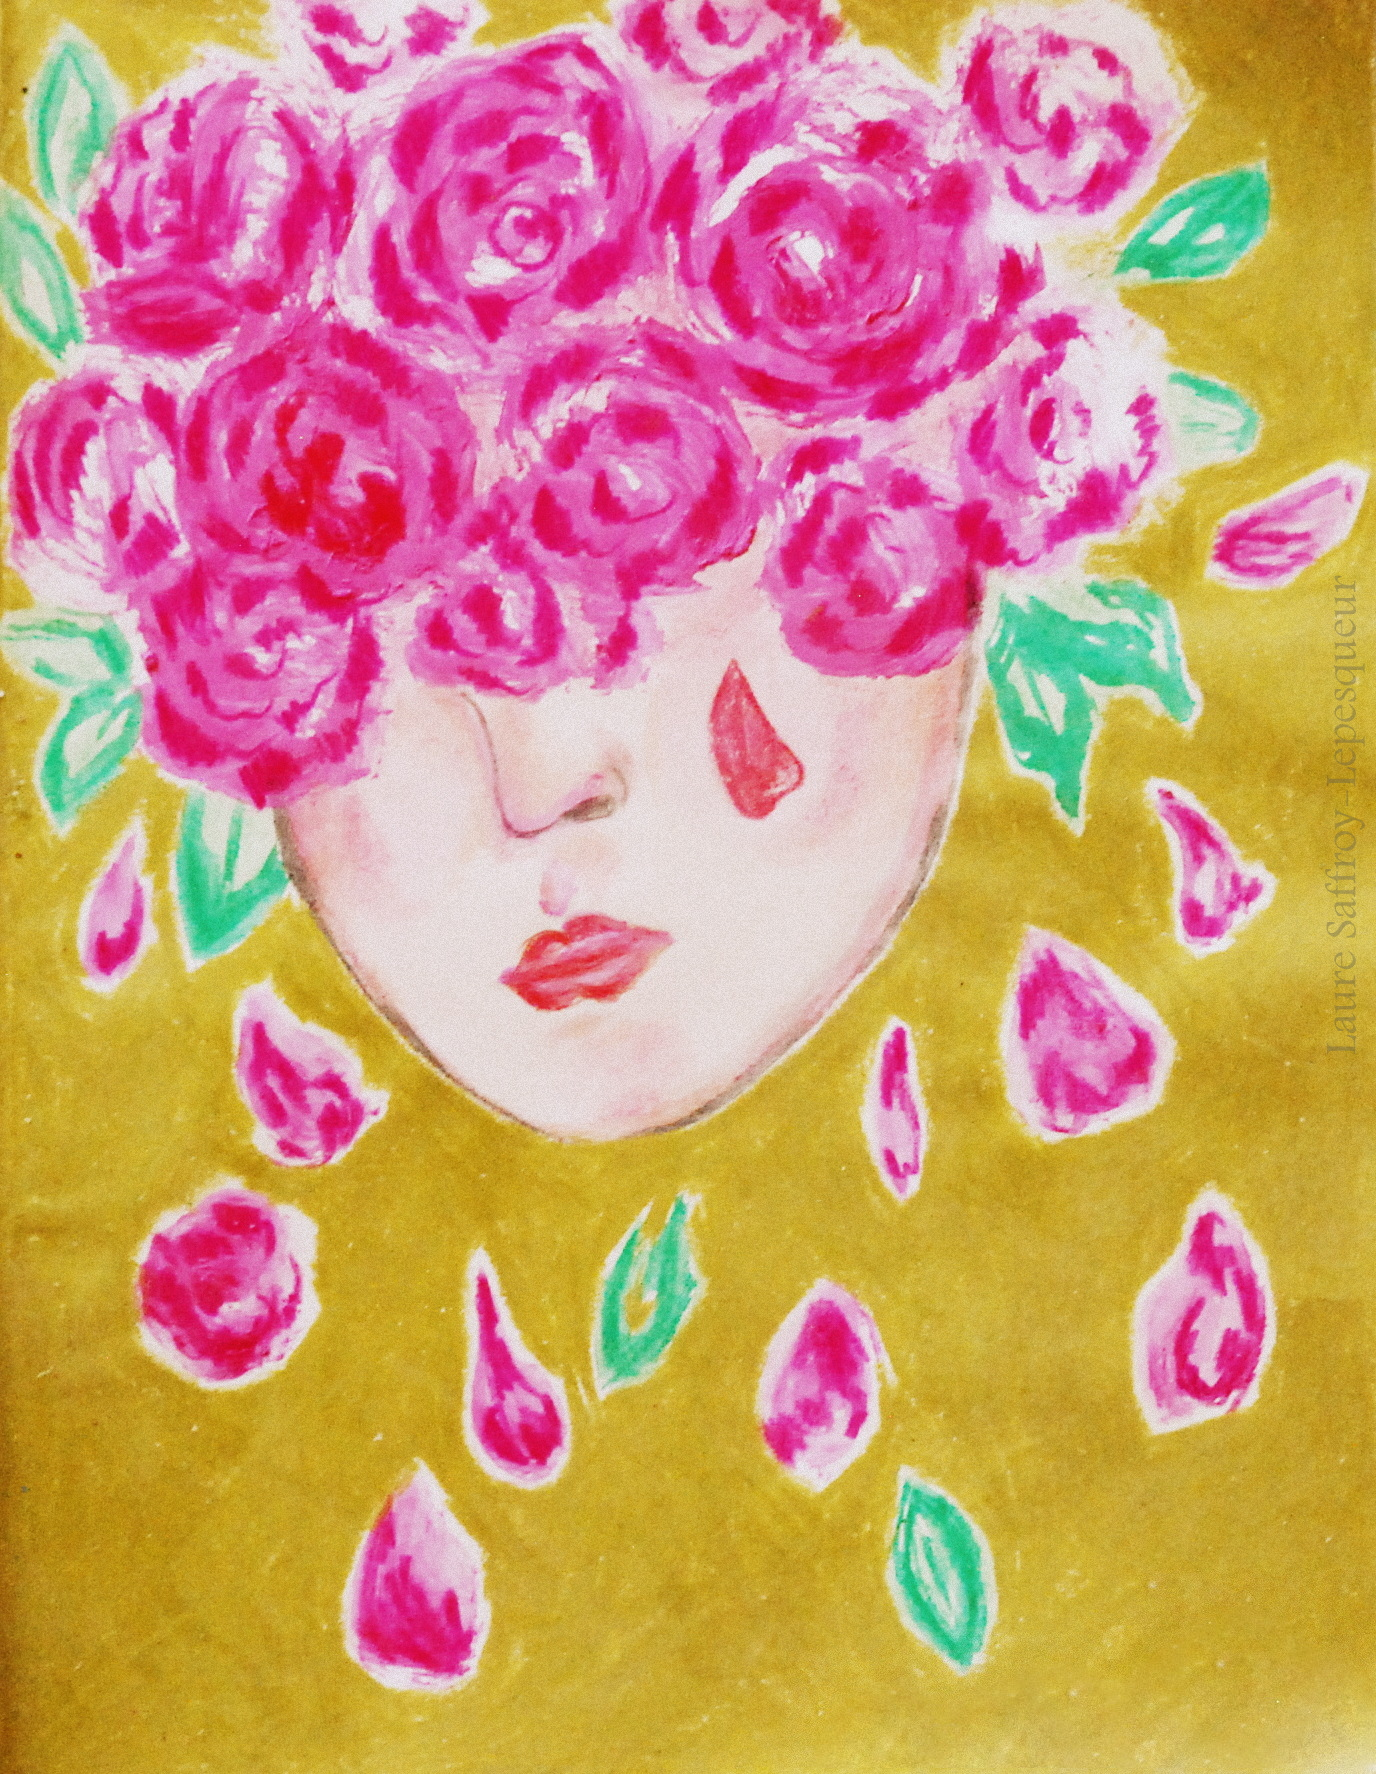 Rose en pleurs